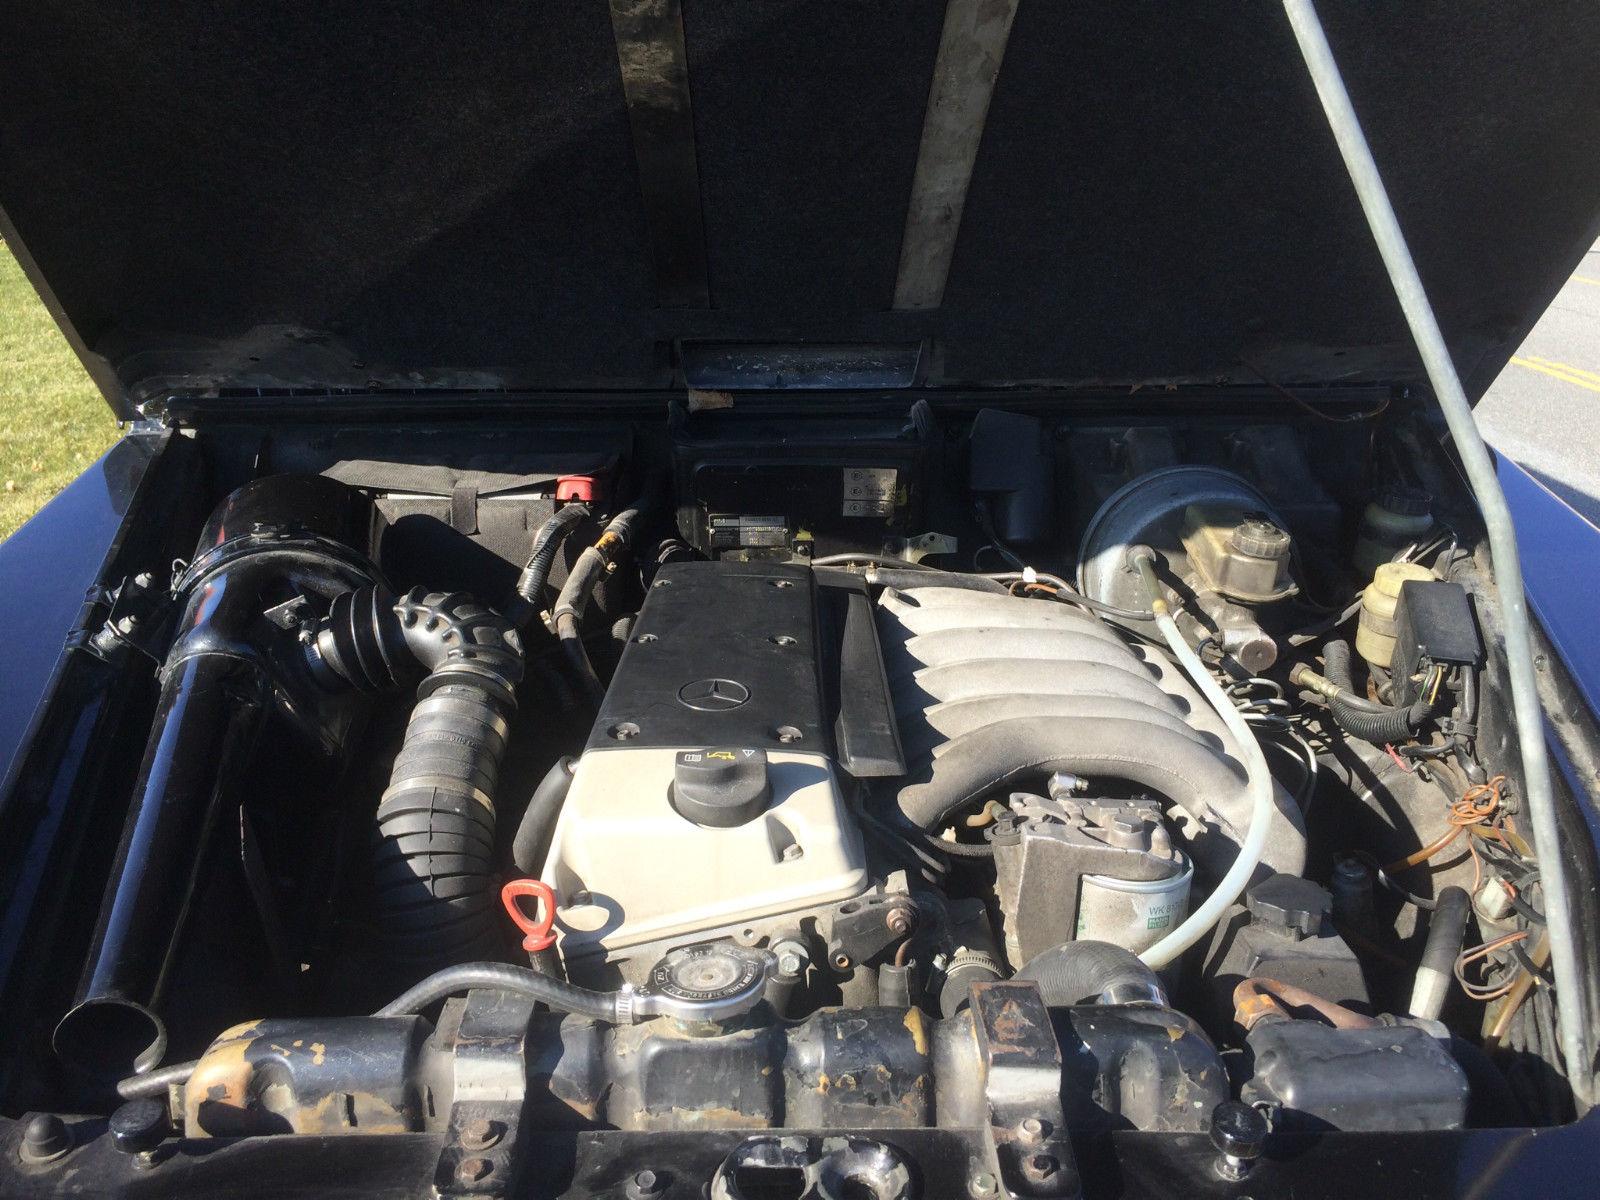 Mercedes G Wagon 3 0 turbo diesel OM606 engine for sale in